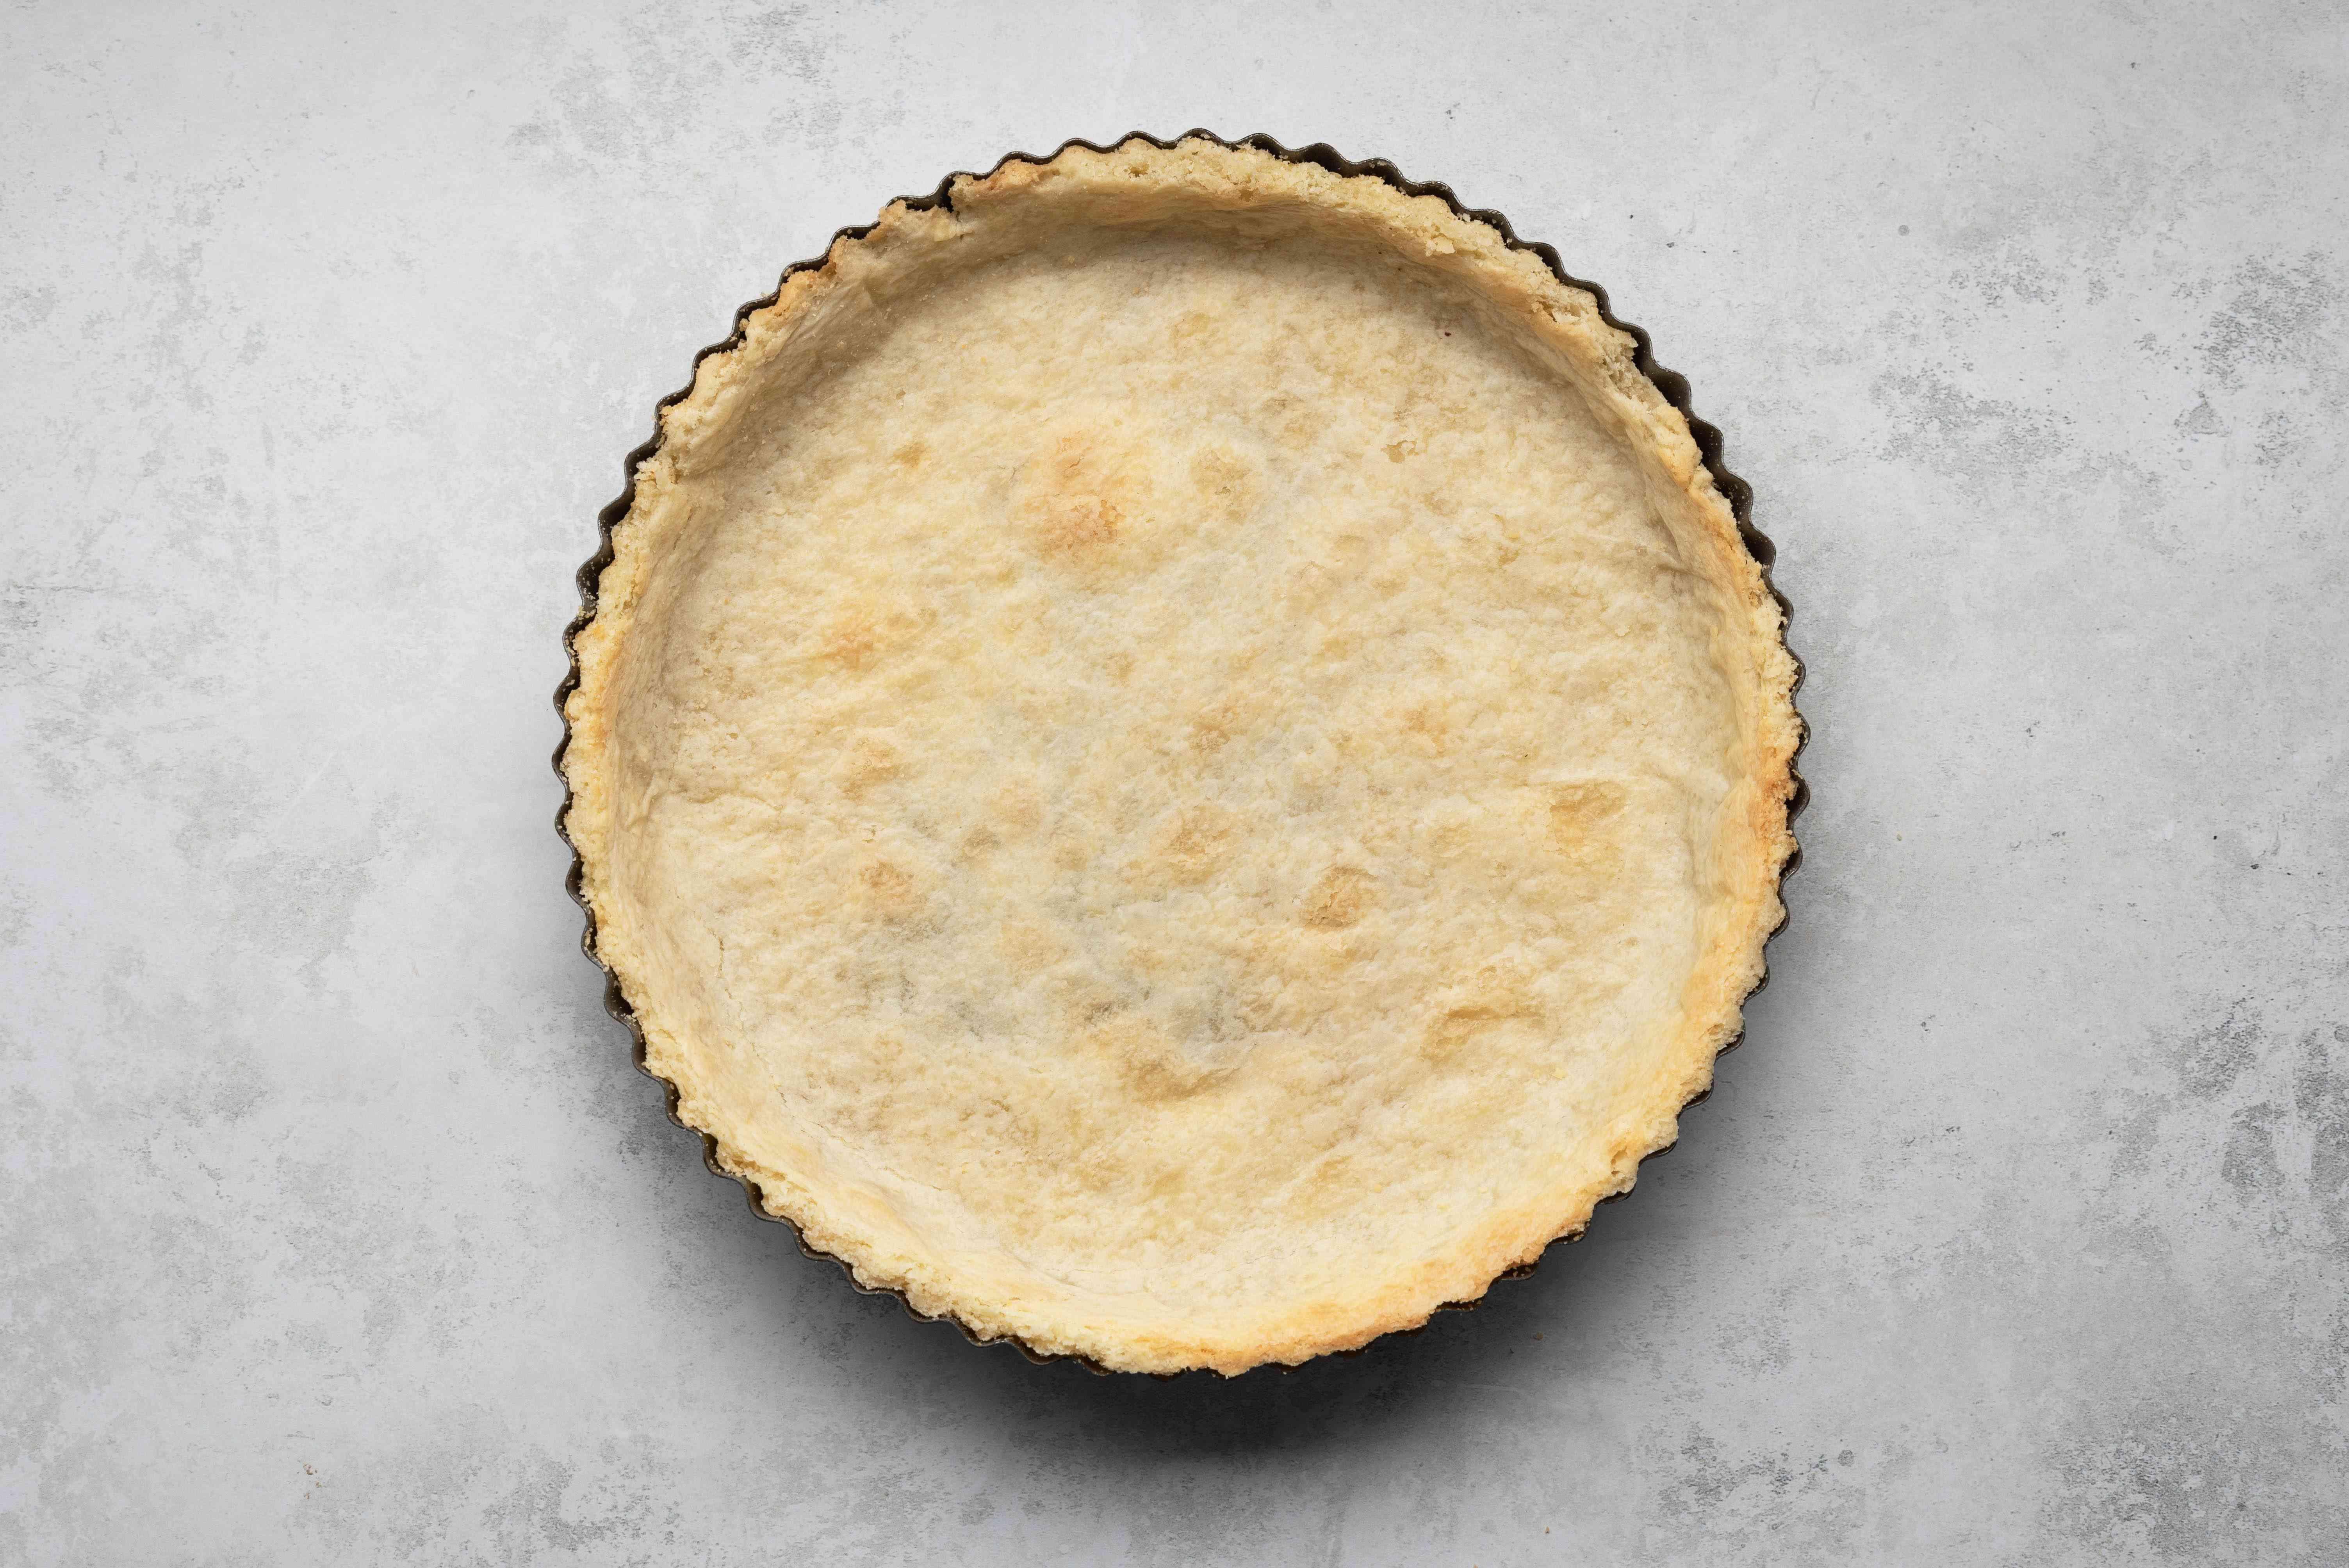 baked tart crust in a tart pan